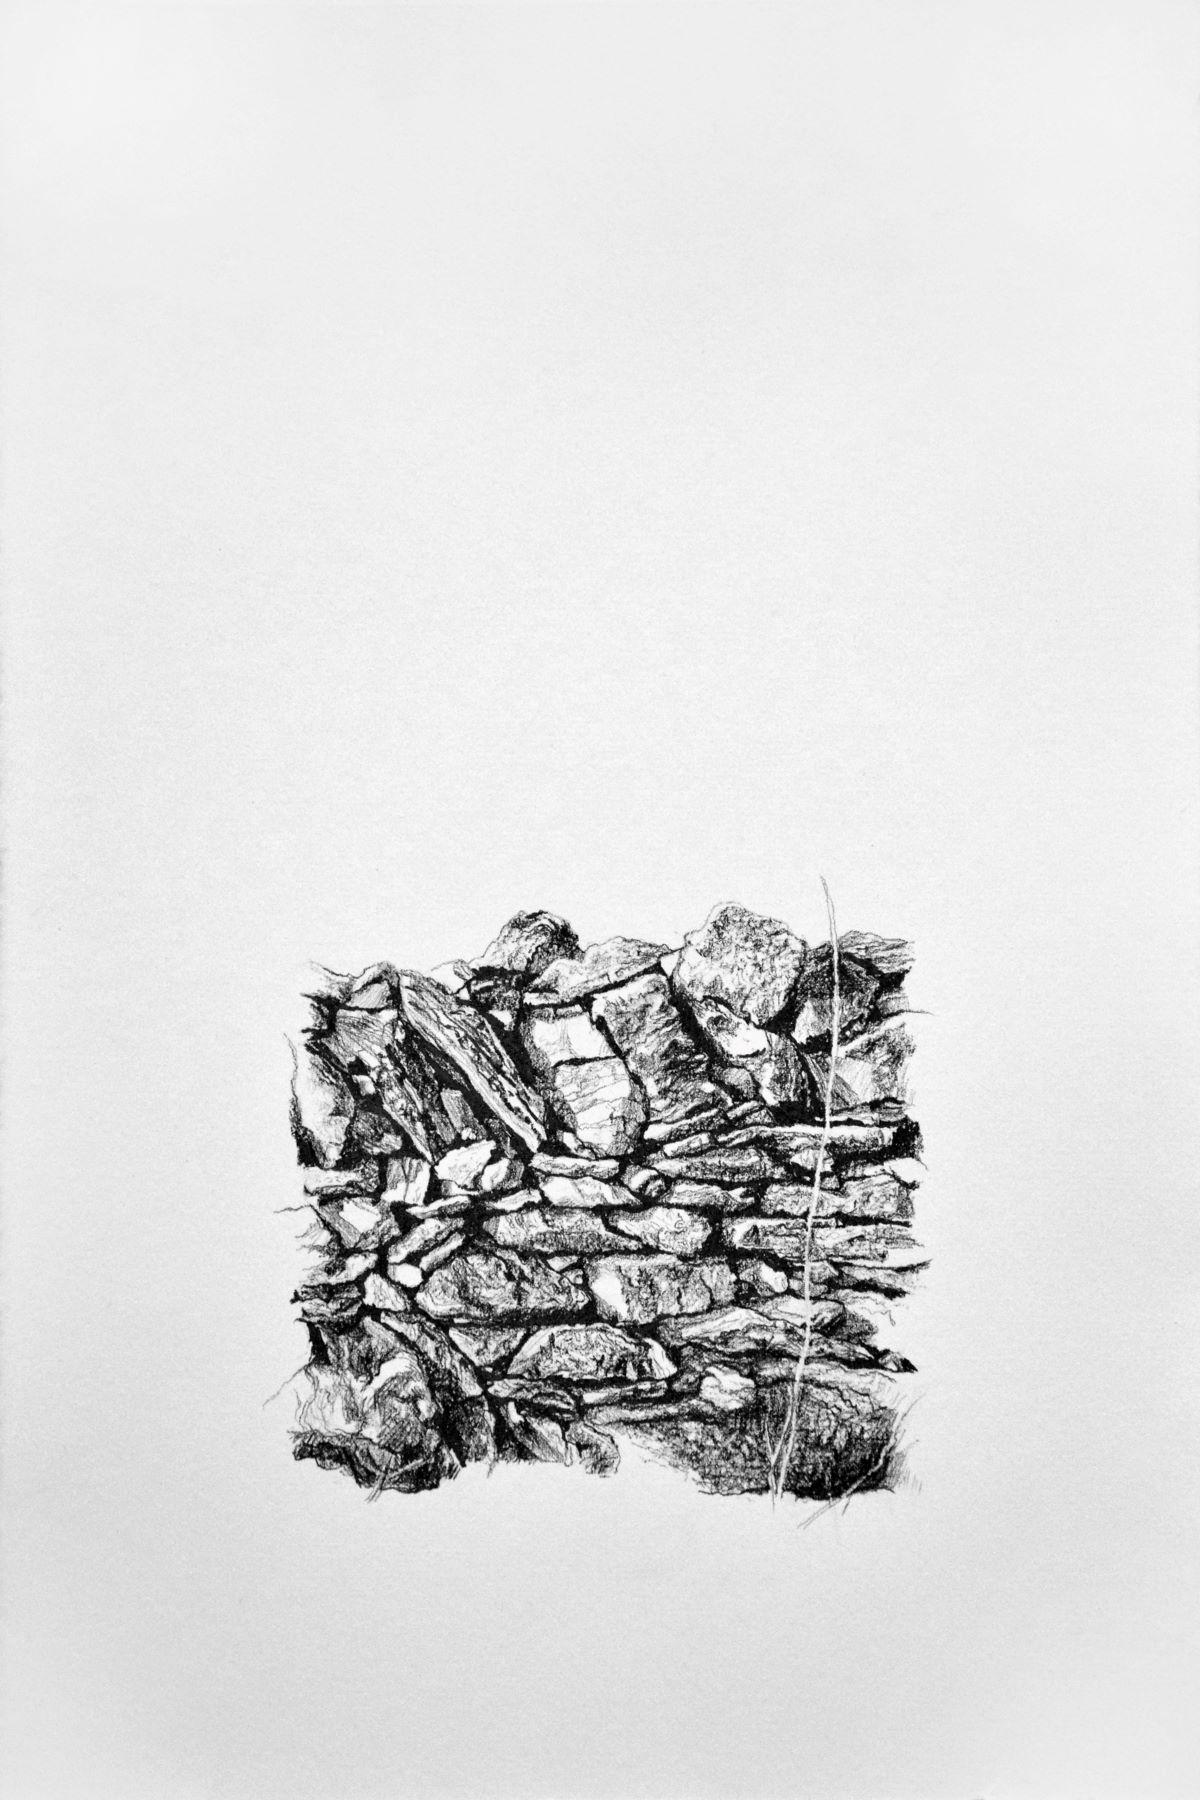 Xerolithia 3, drawing. Graphite on Arches Paper, by artist Neva Bergemann